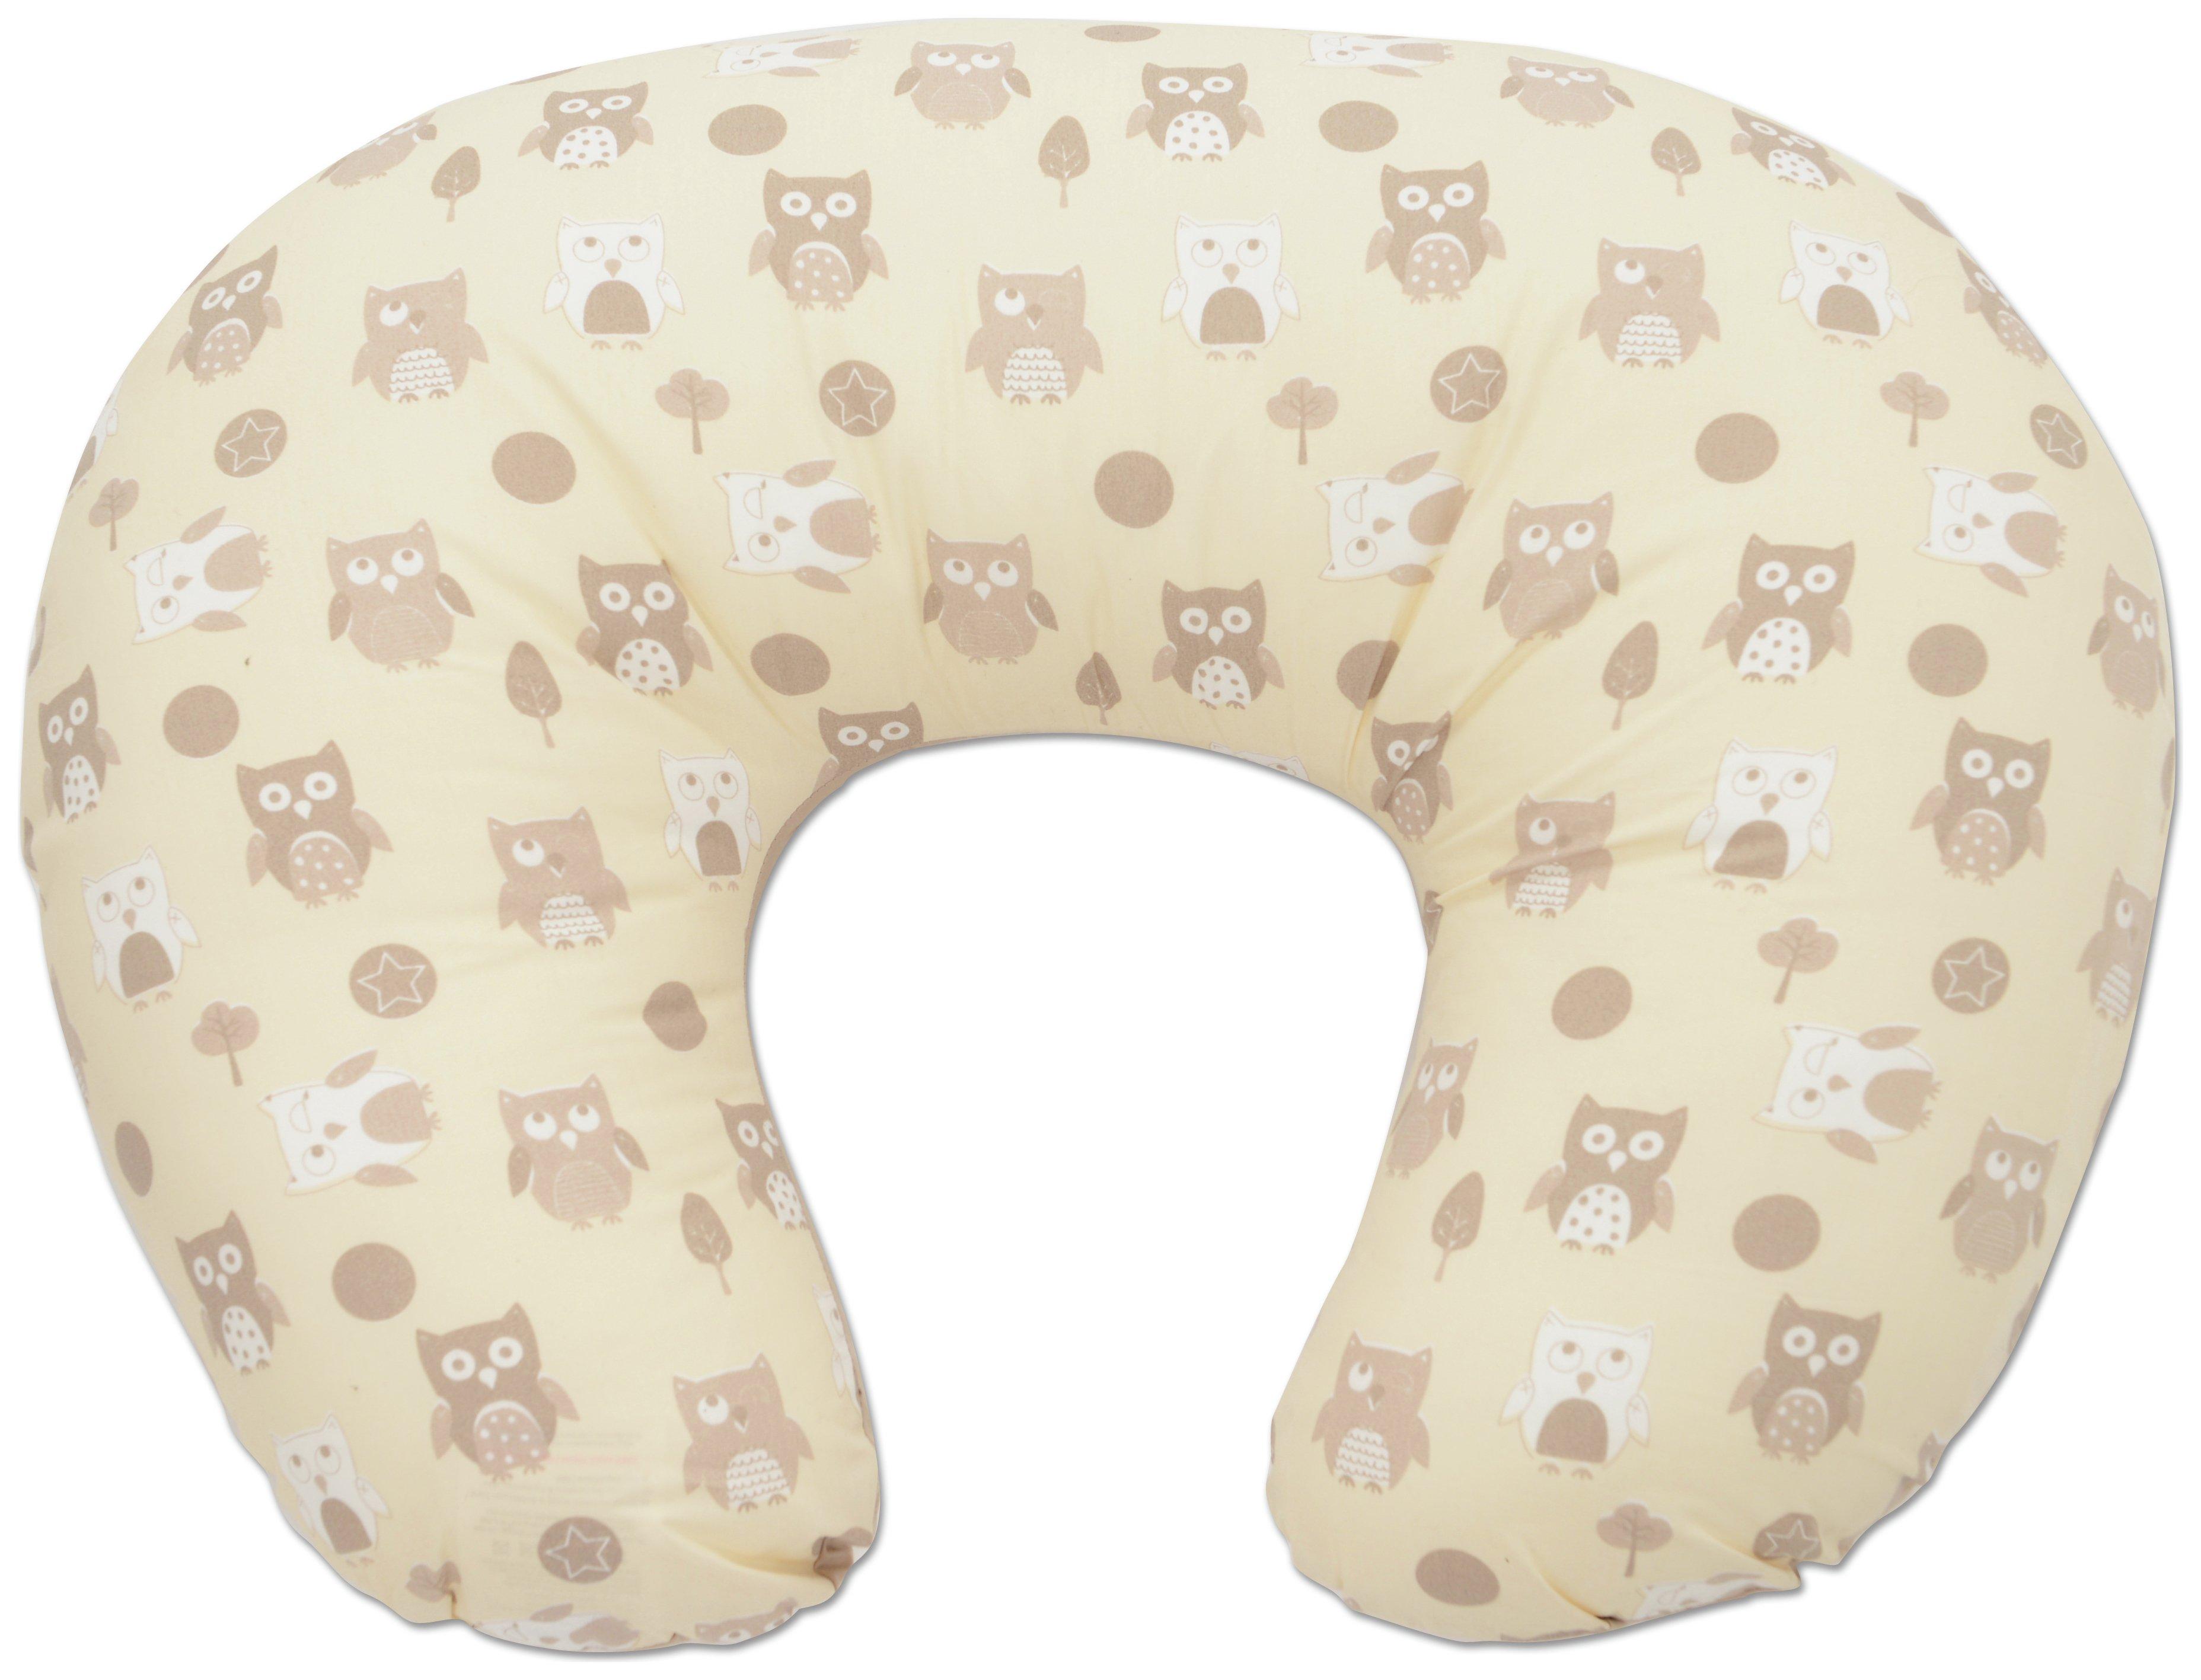 Image of Dreamgenii - Donut Owl - Breast Feeding Pillow - Neutral